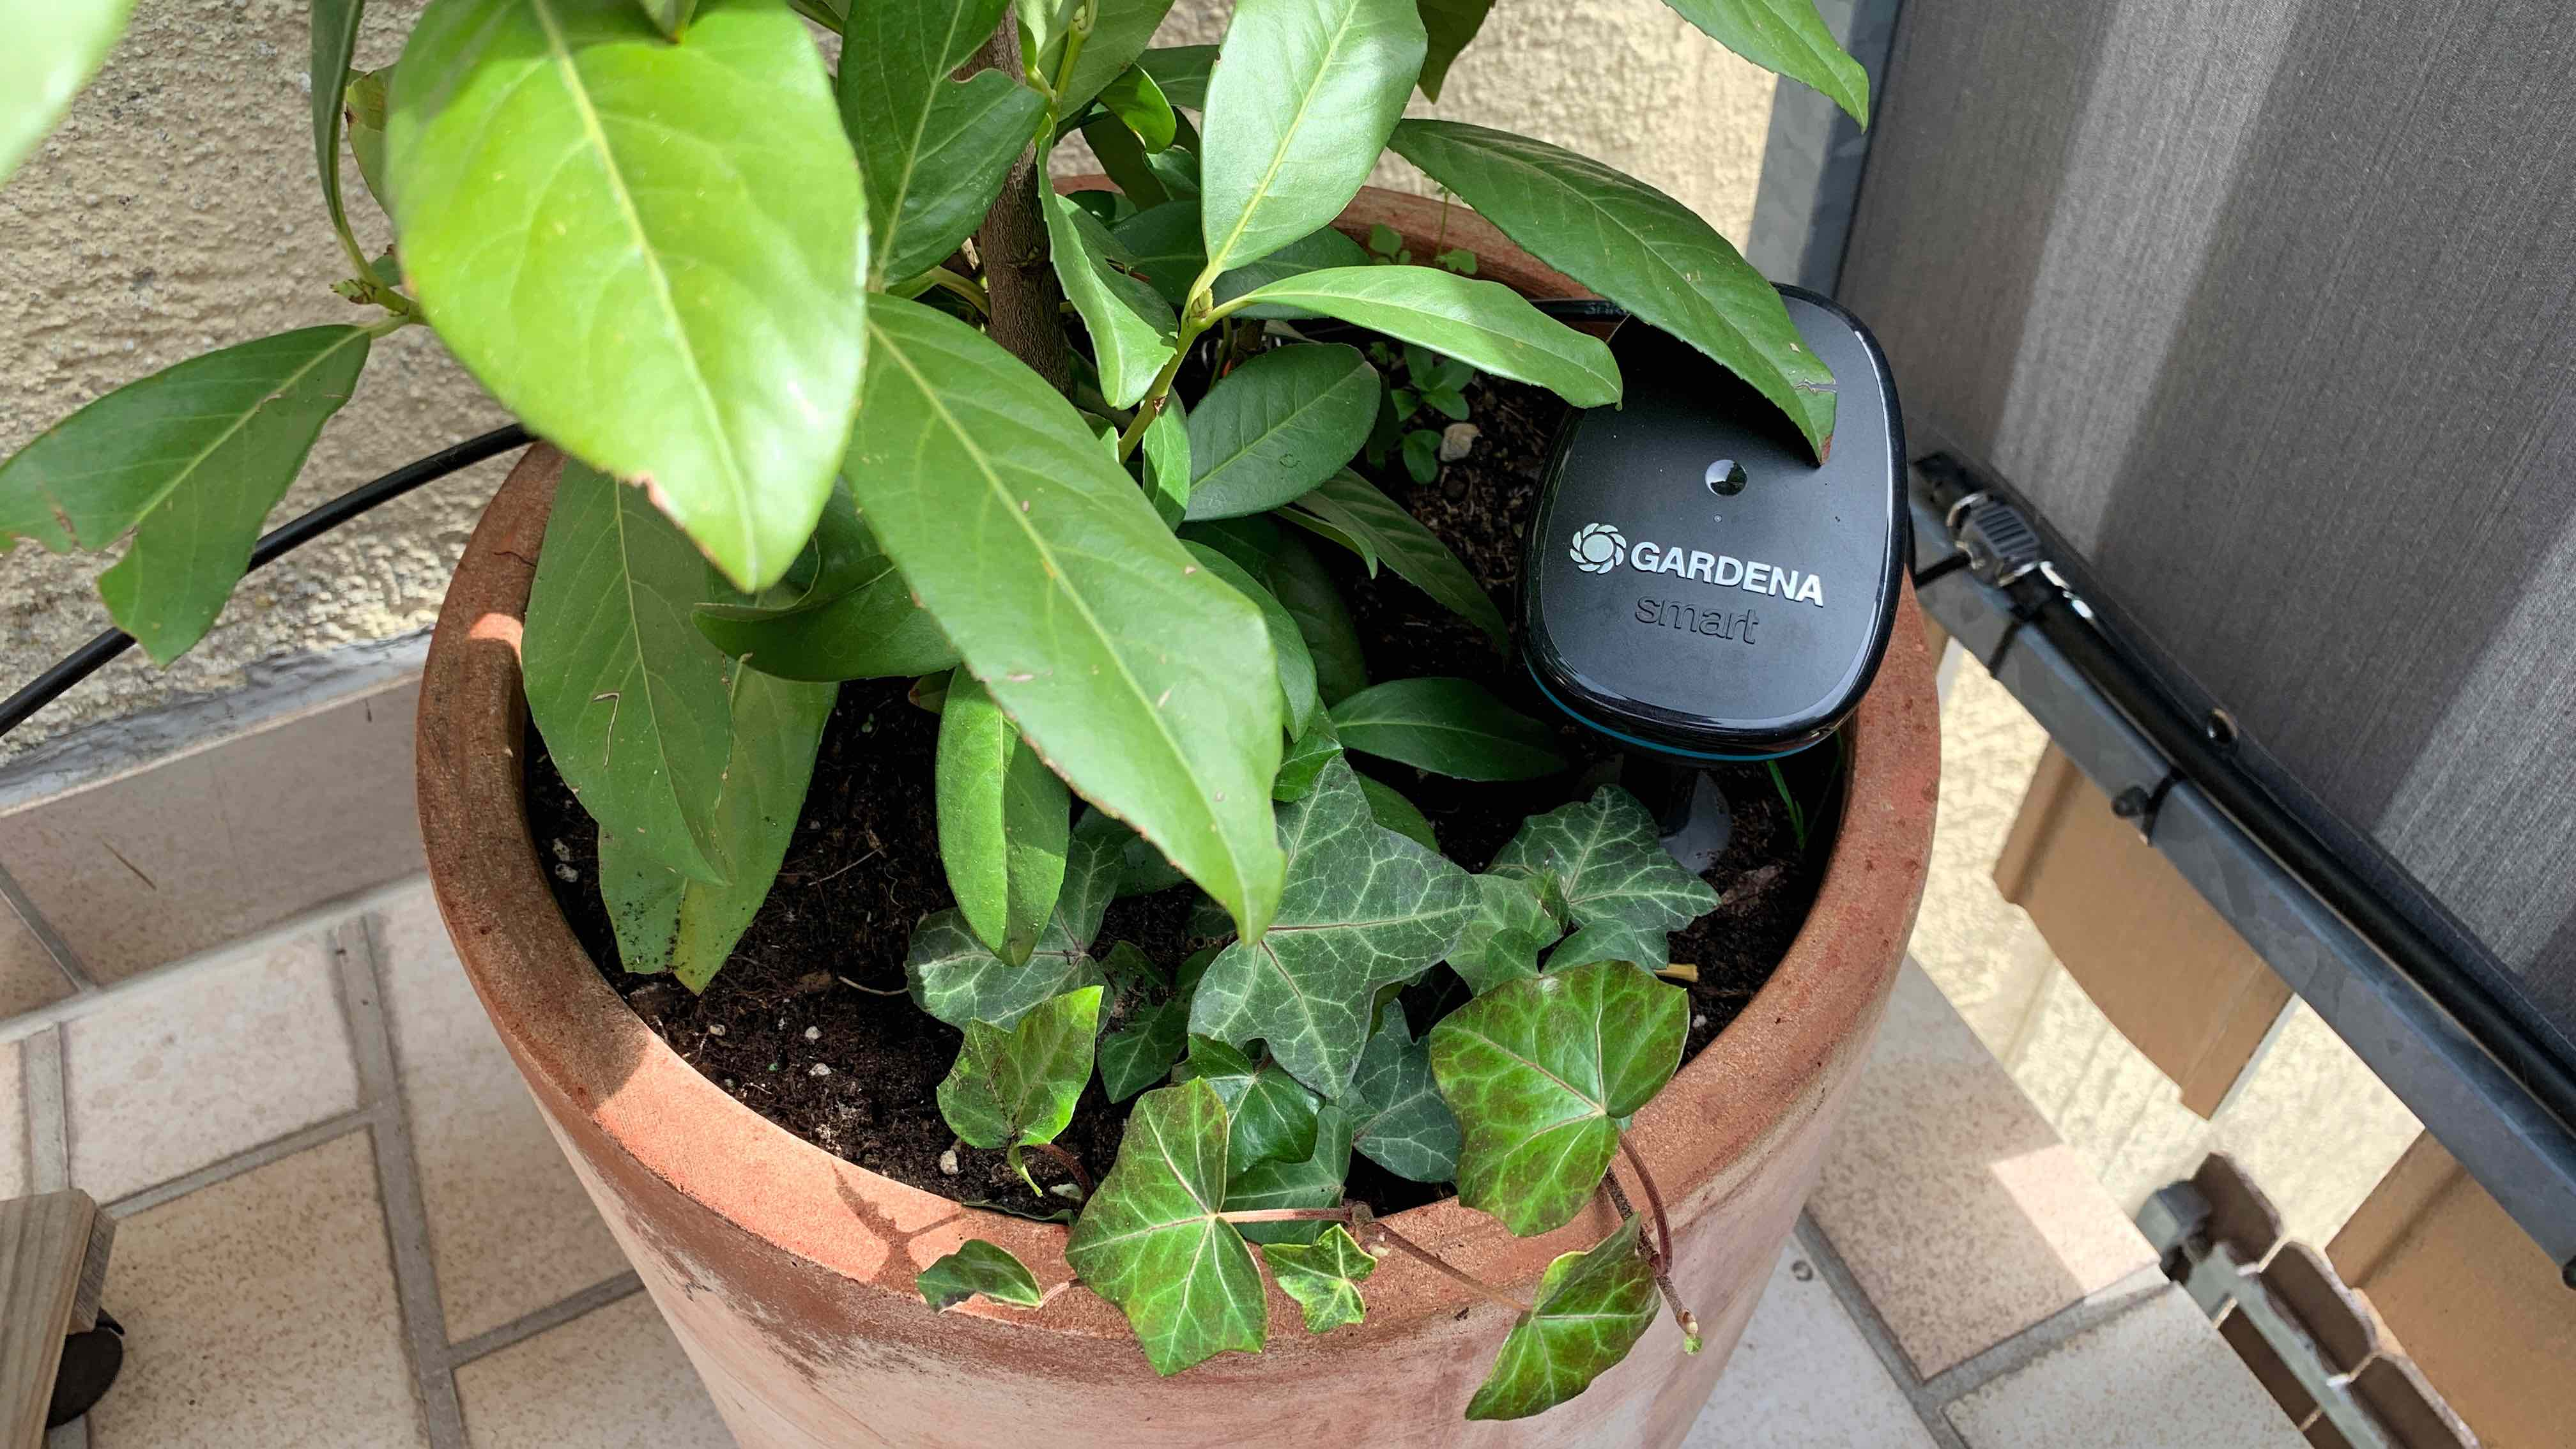 Eve_Aqua_HomeKit_Gardena_Terrasse_Balkon_Pflanzen_Bewässerung5 Wie HomeKit deine Pflanzen auf Balkon/Terrasse automatisiert bewässert